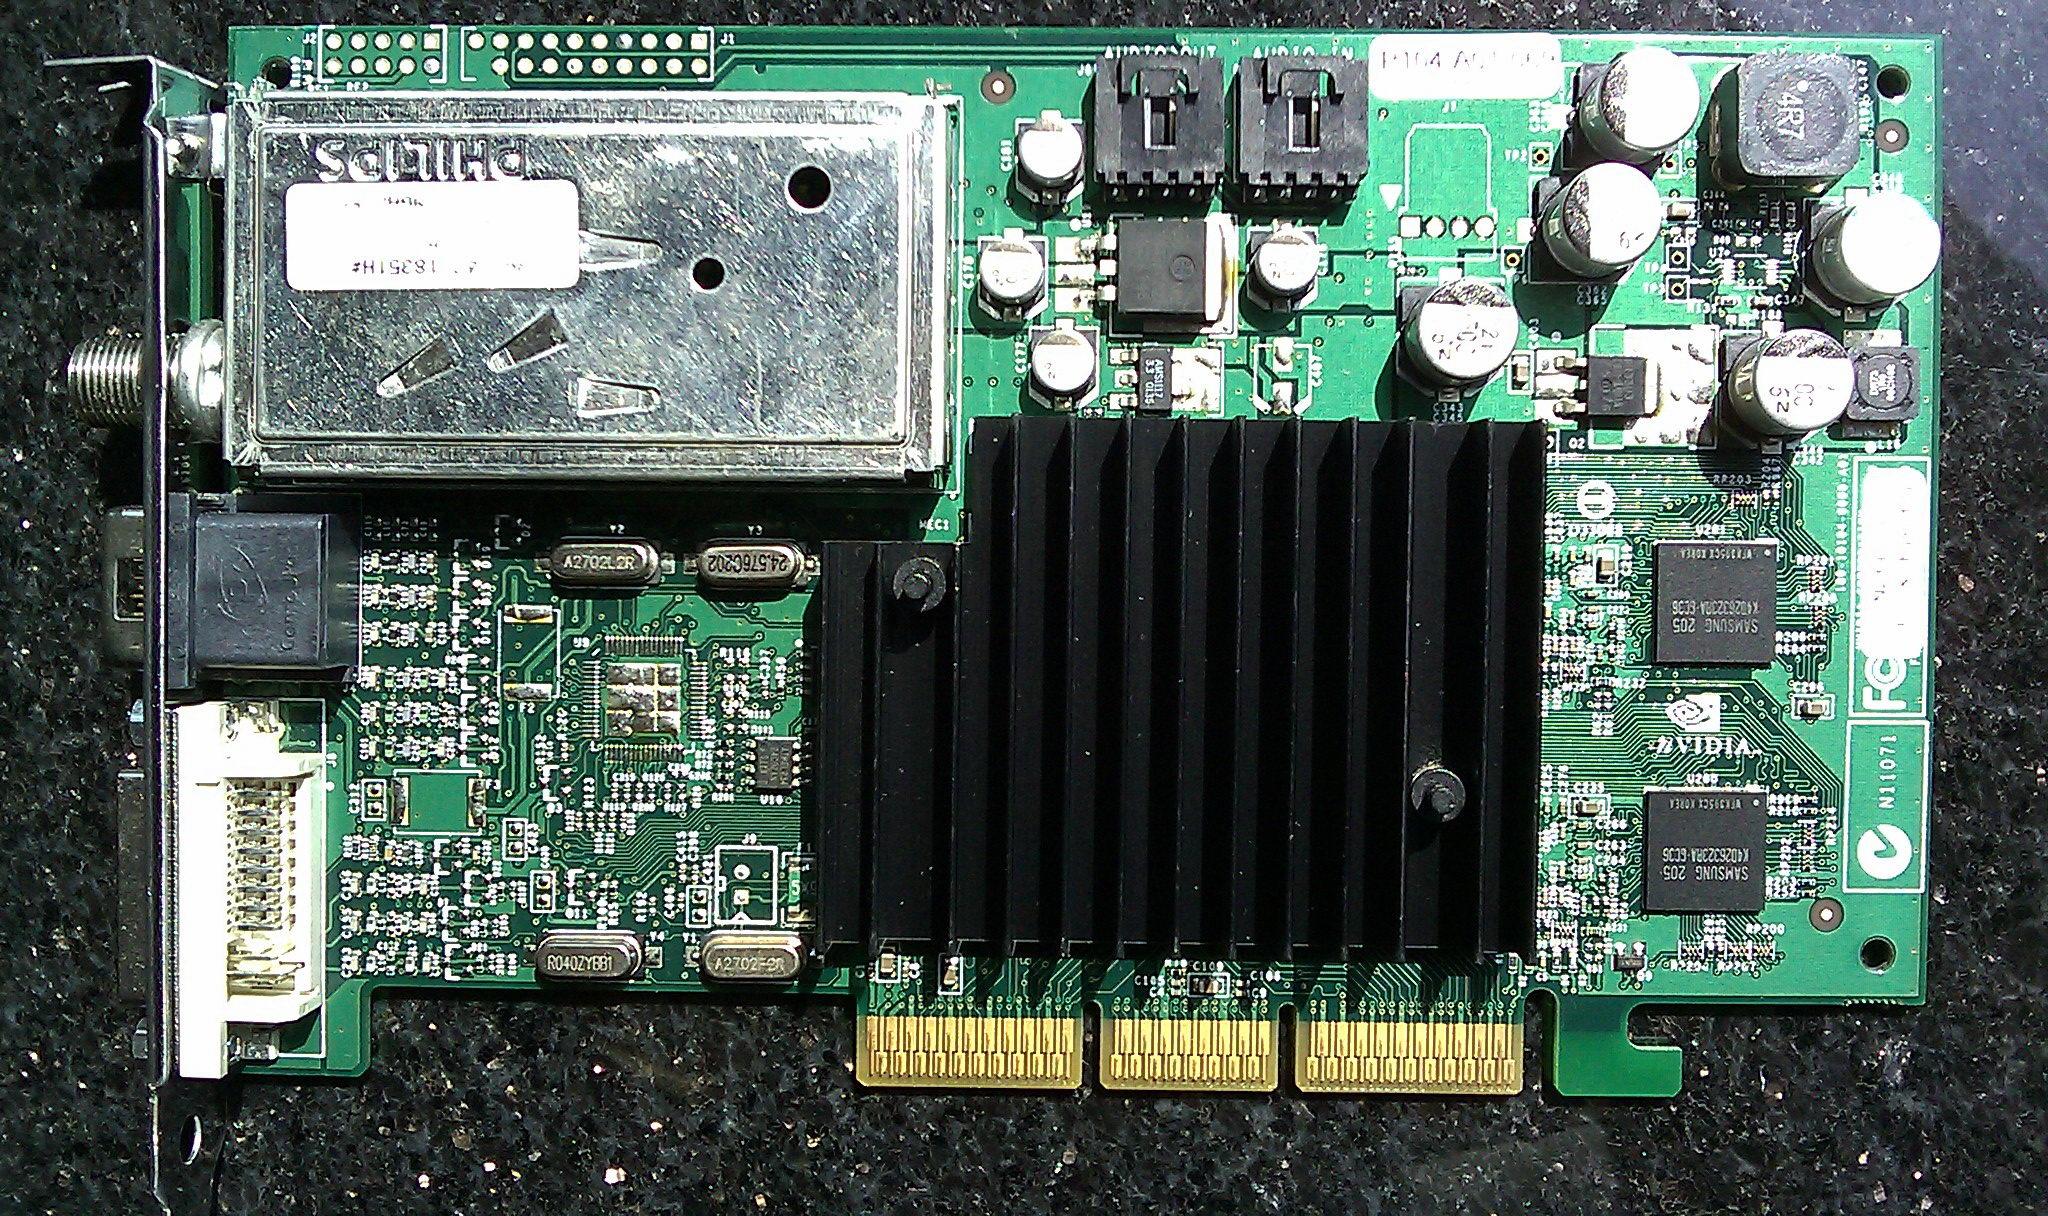 GEFORCE4 MX 640 WINDOWS DRIVER